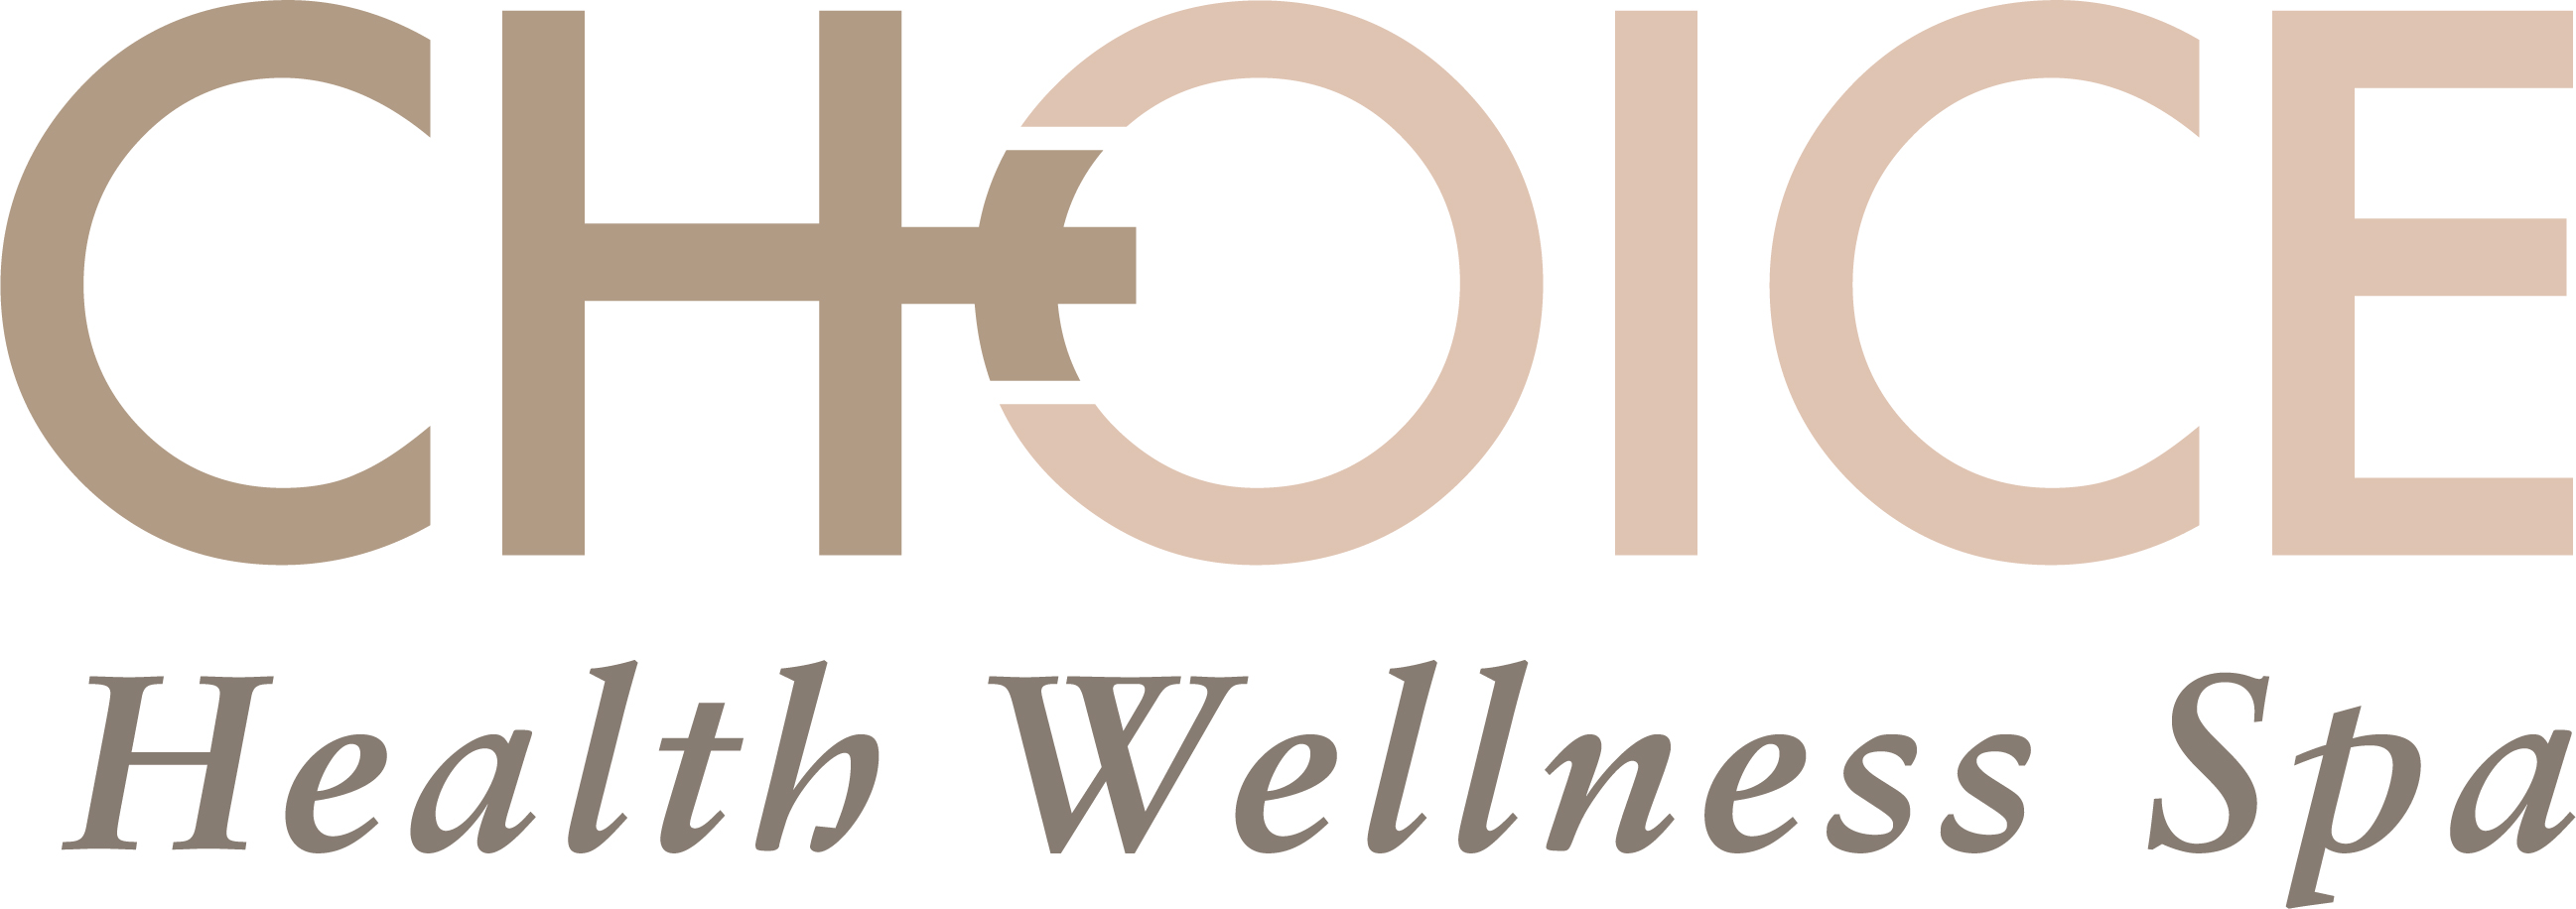 CHOICE HEALTH WELLNESS SPA